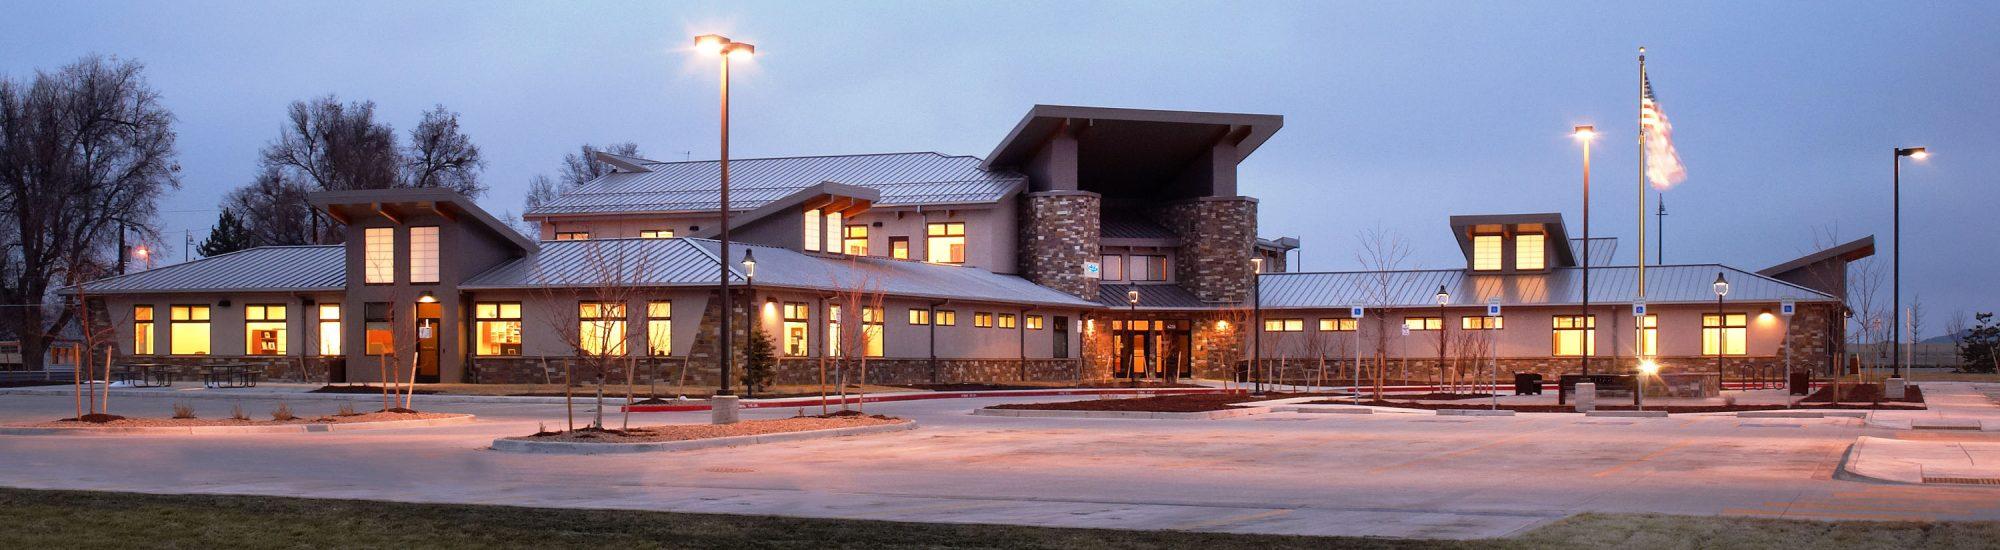 Commerce City Salud Family Health Renewable daylighting exterior